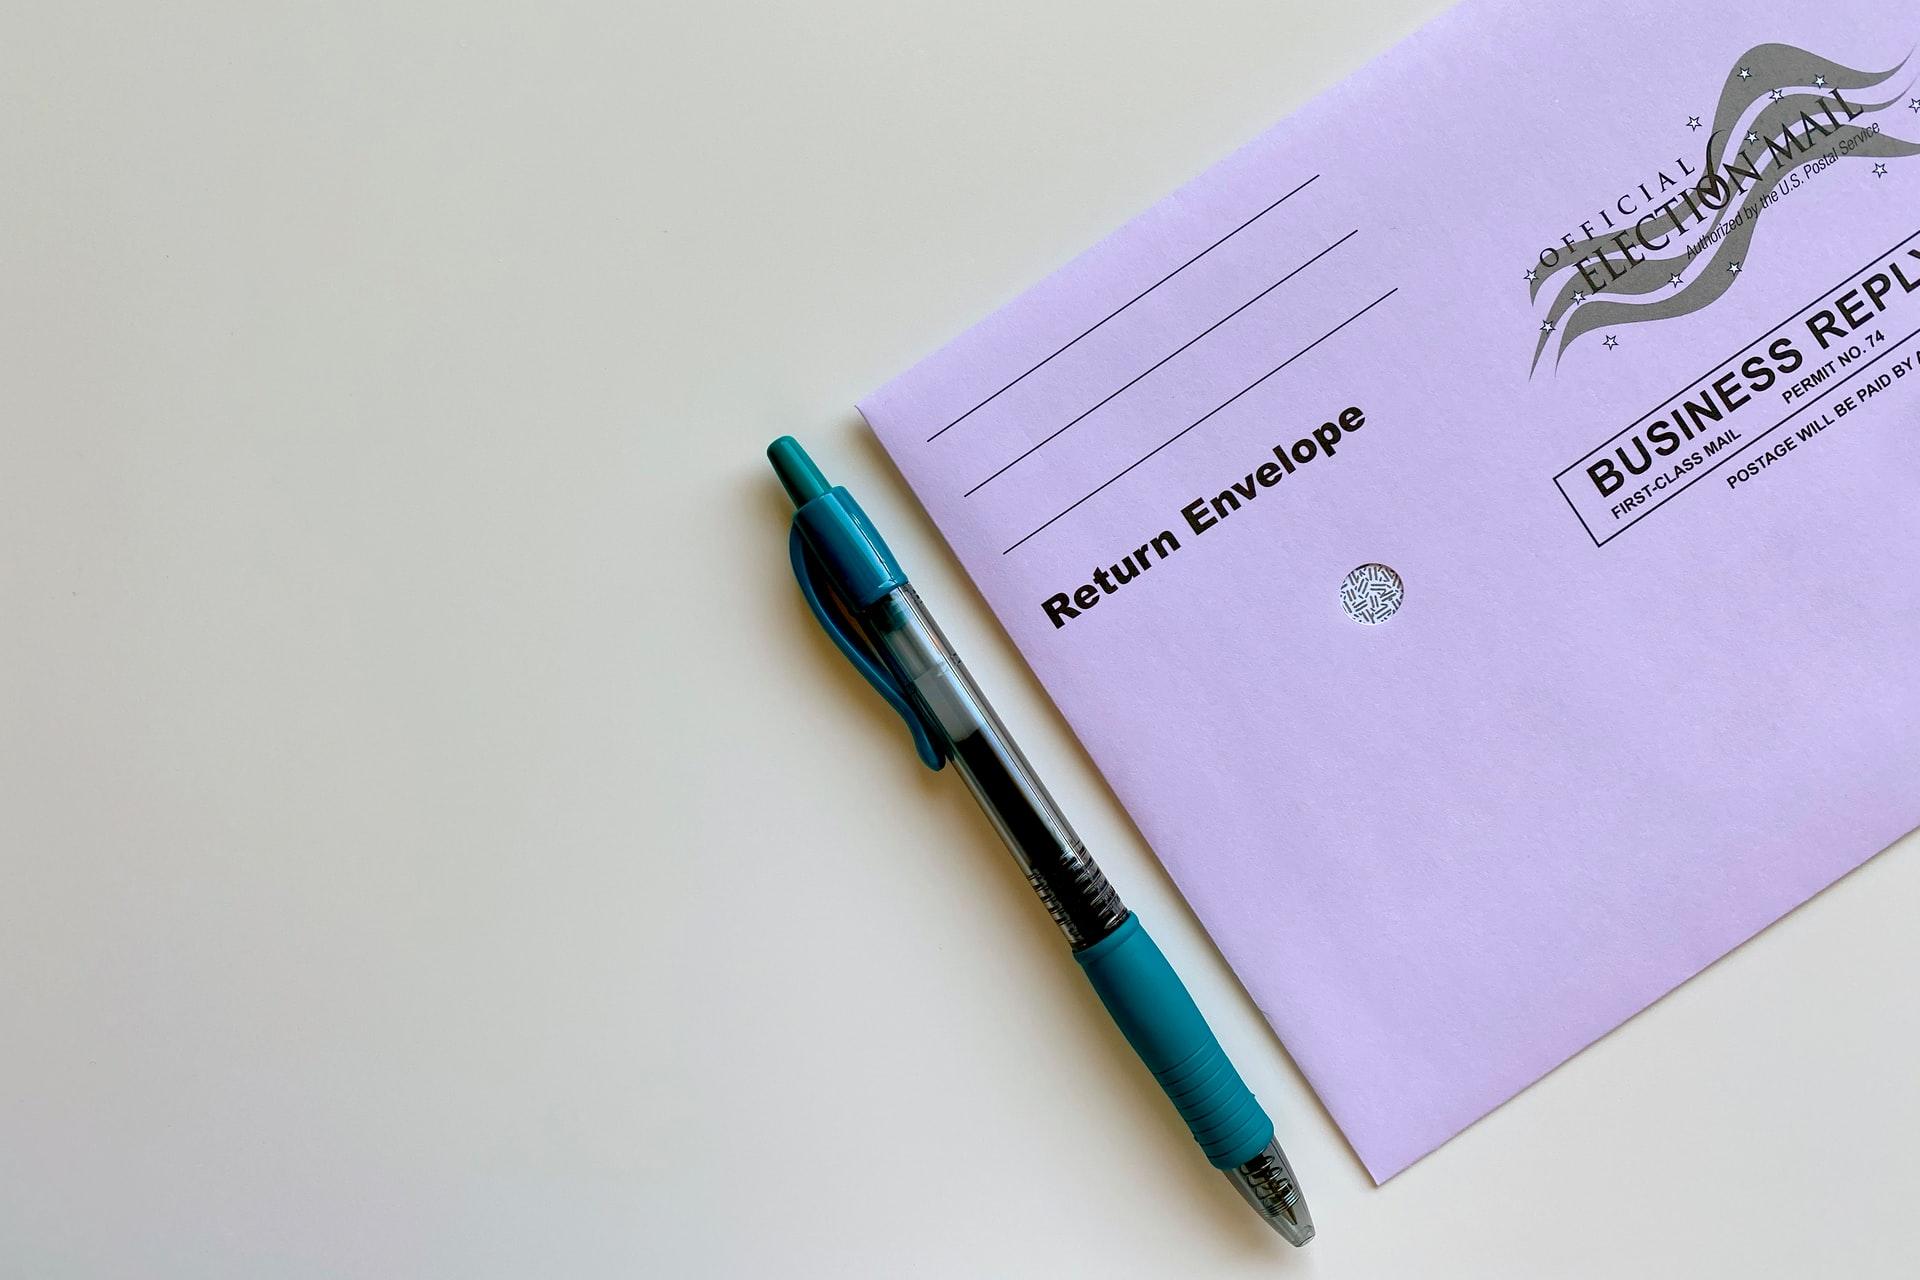 An absentee ballot envelope and a pen